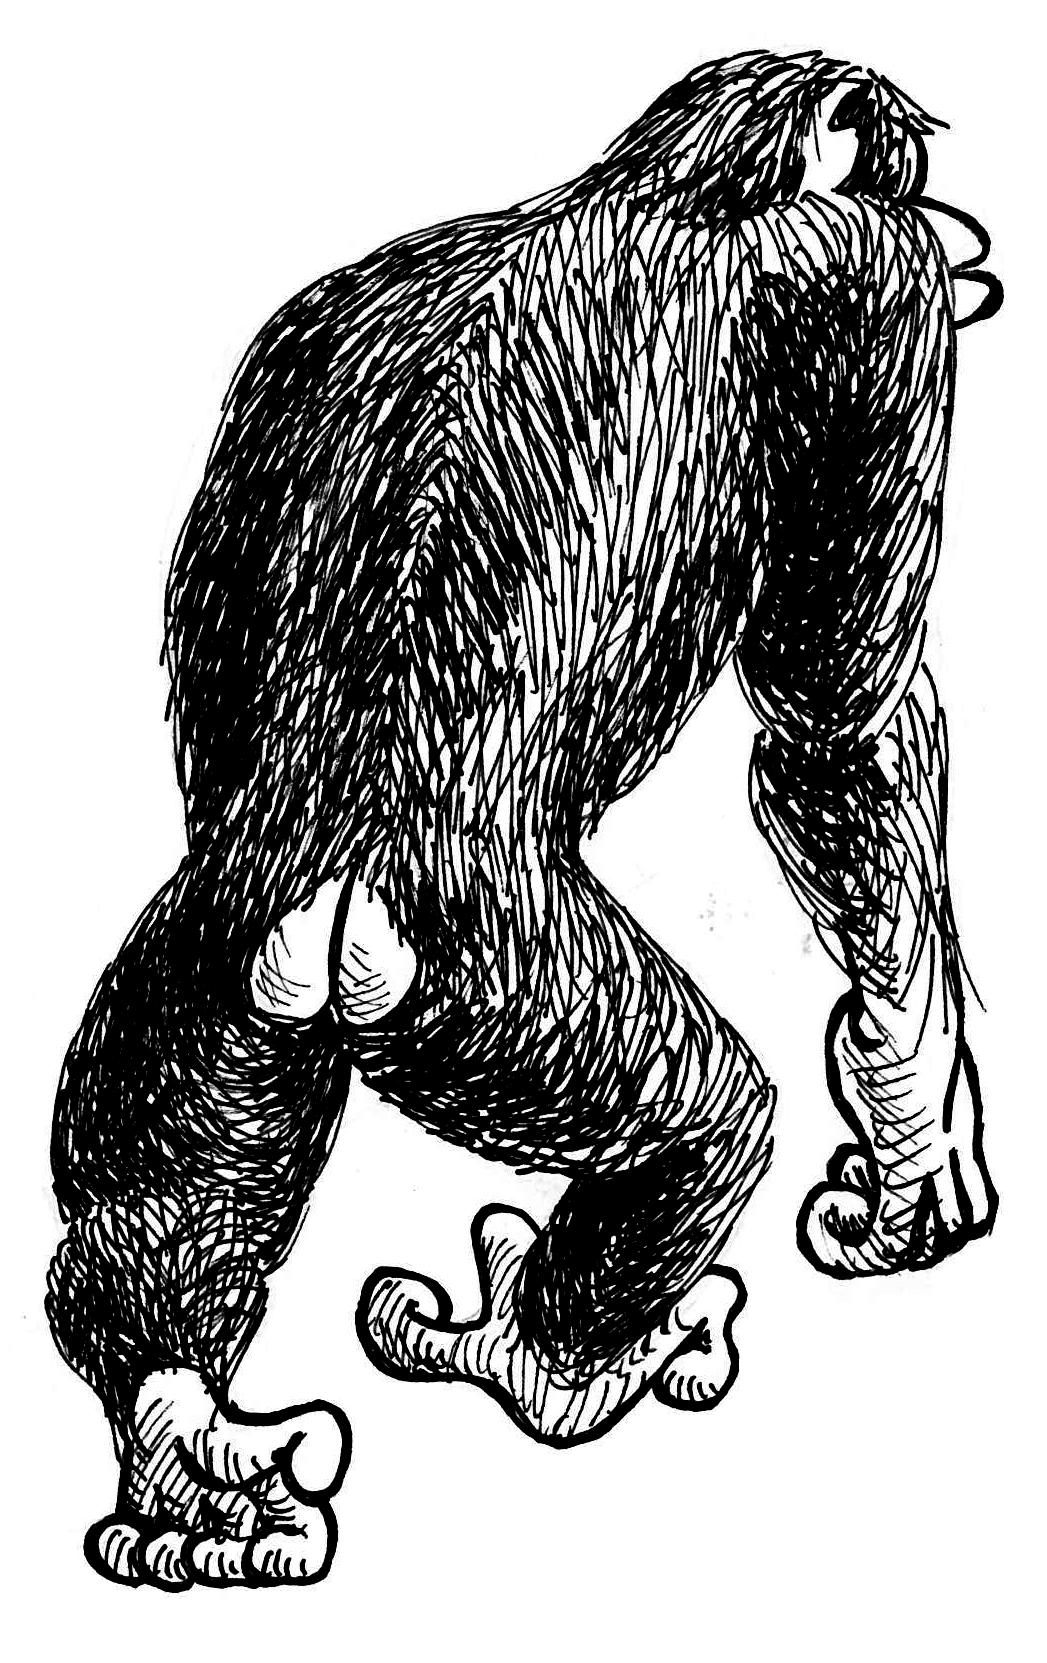 Monkey and Man